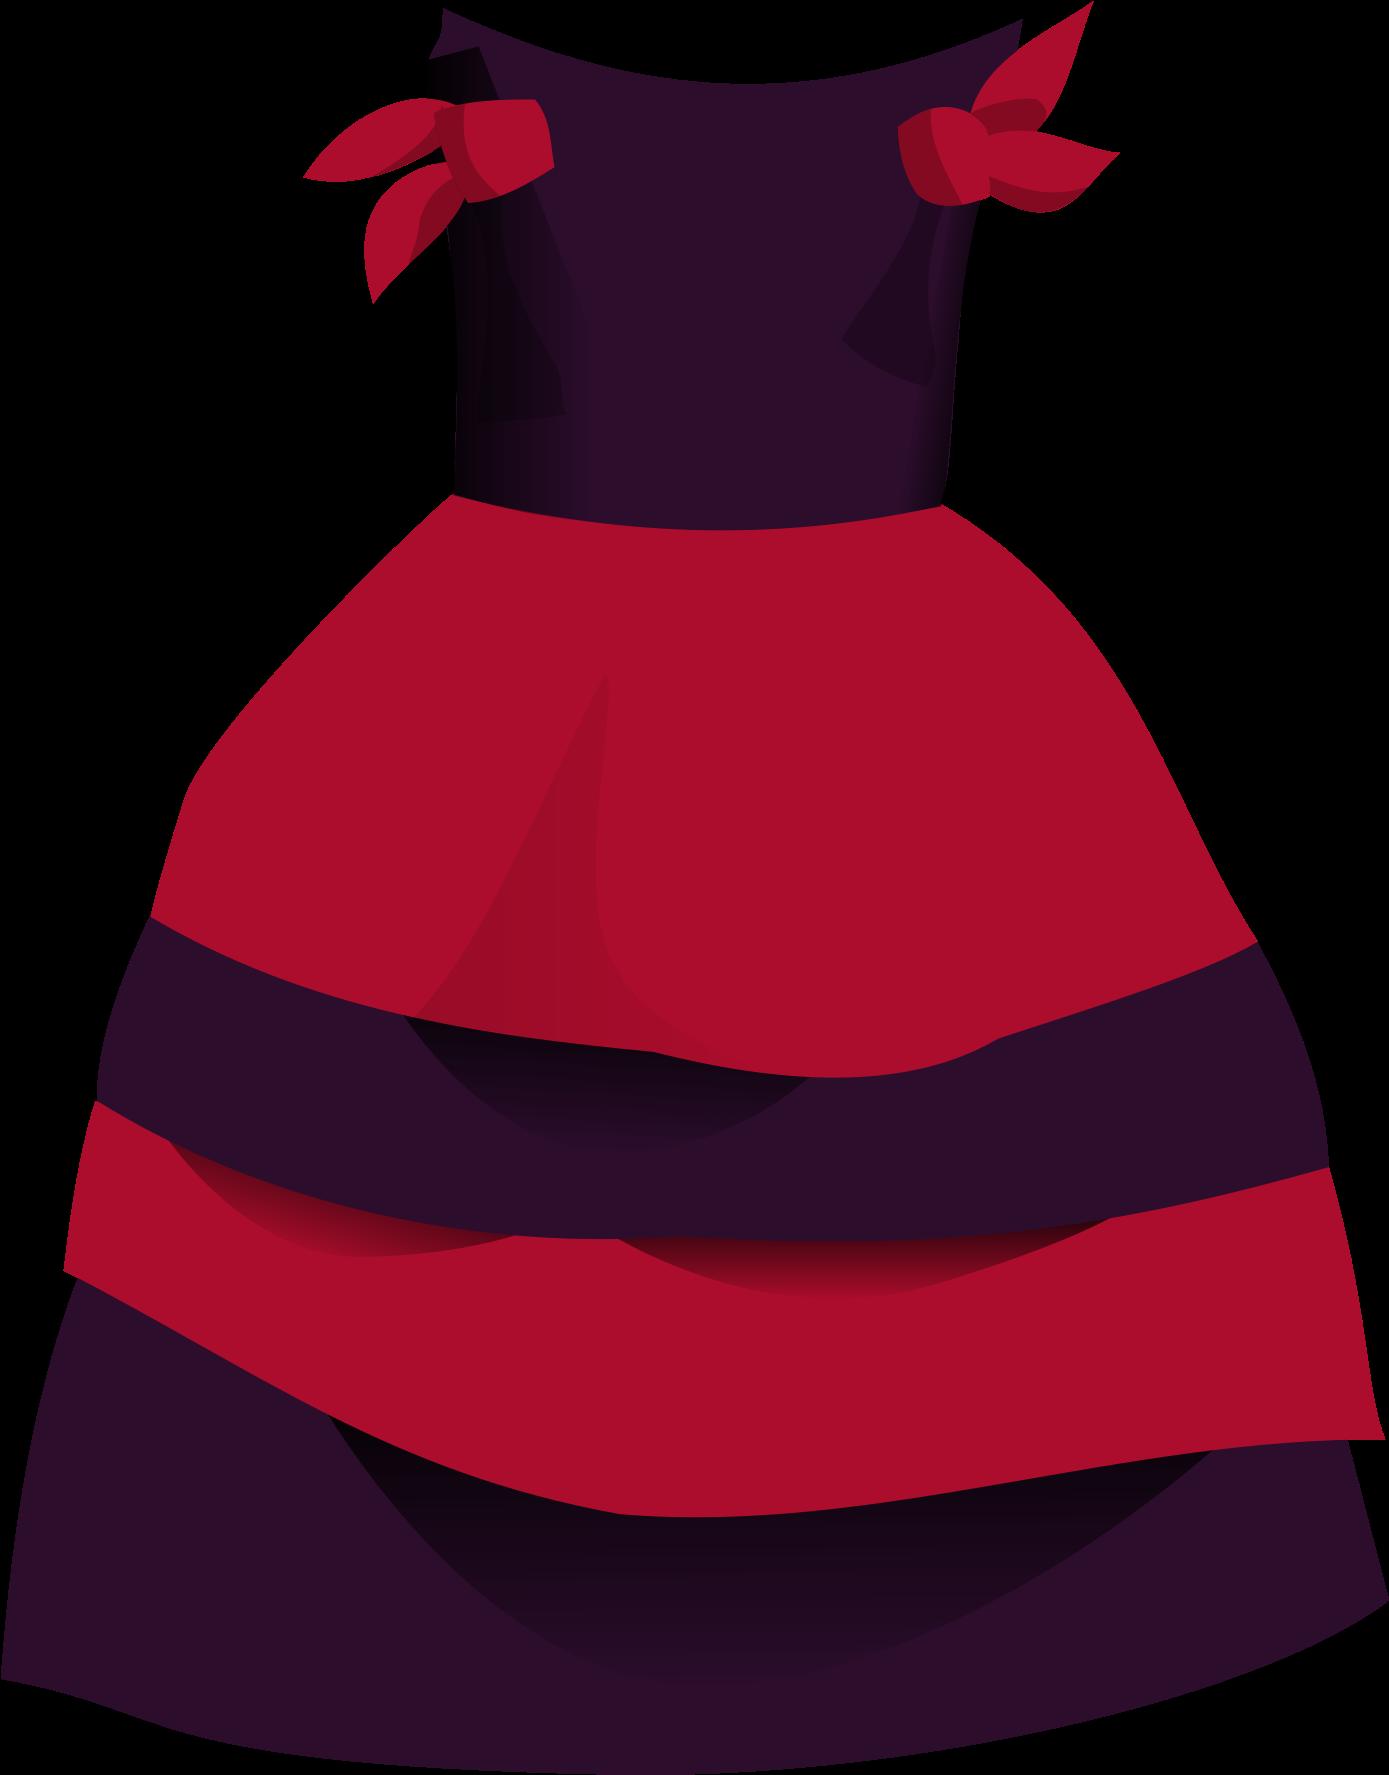 HD Puffy Wedding Dress Clipart.